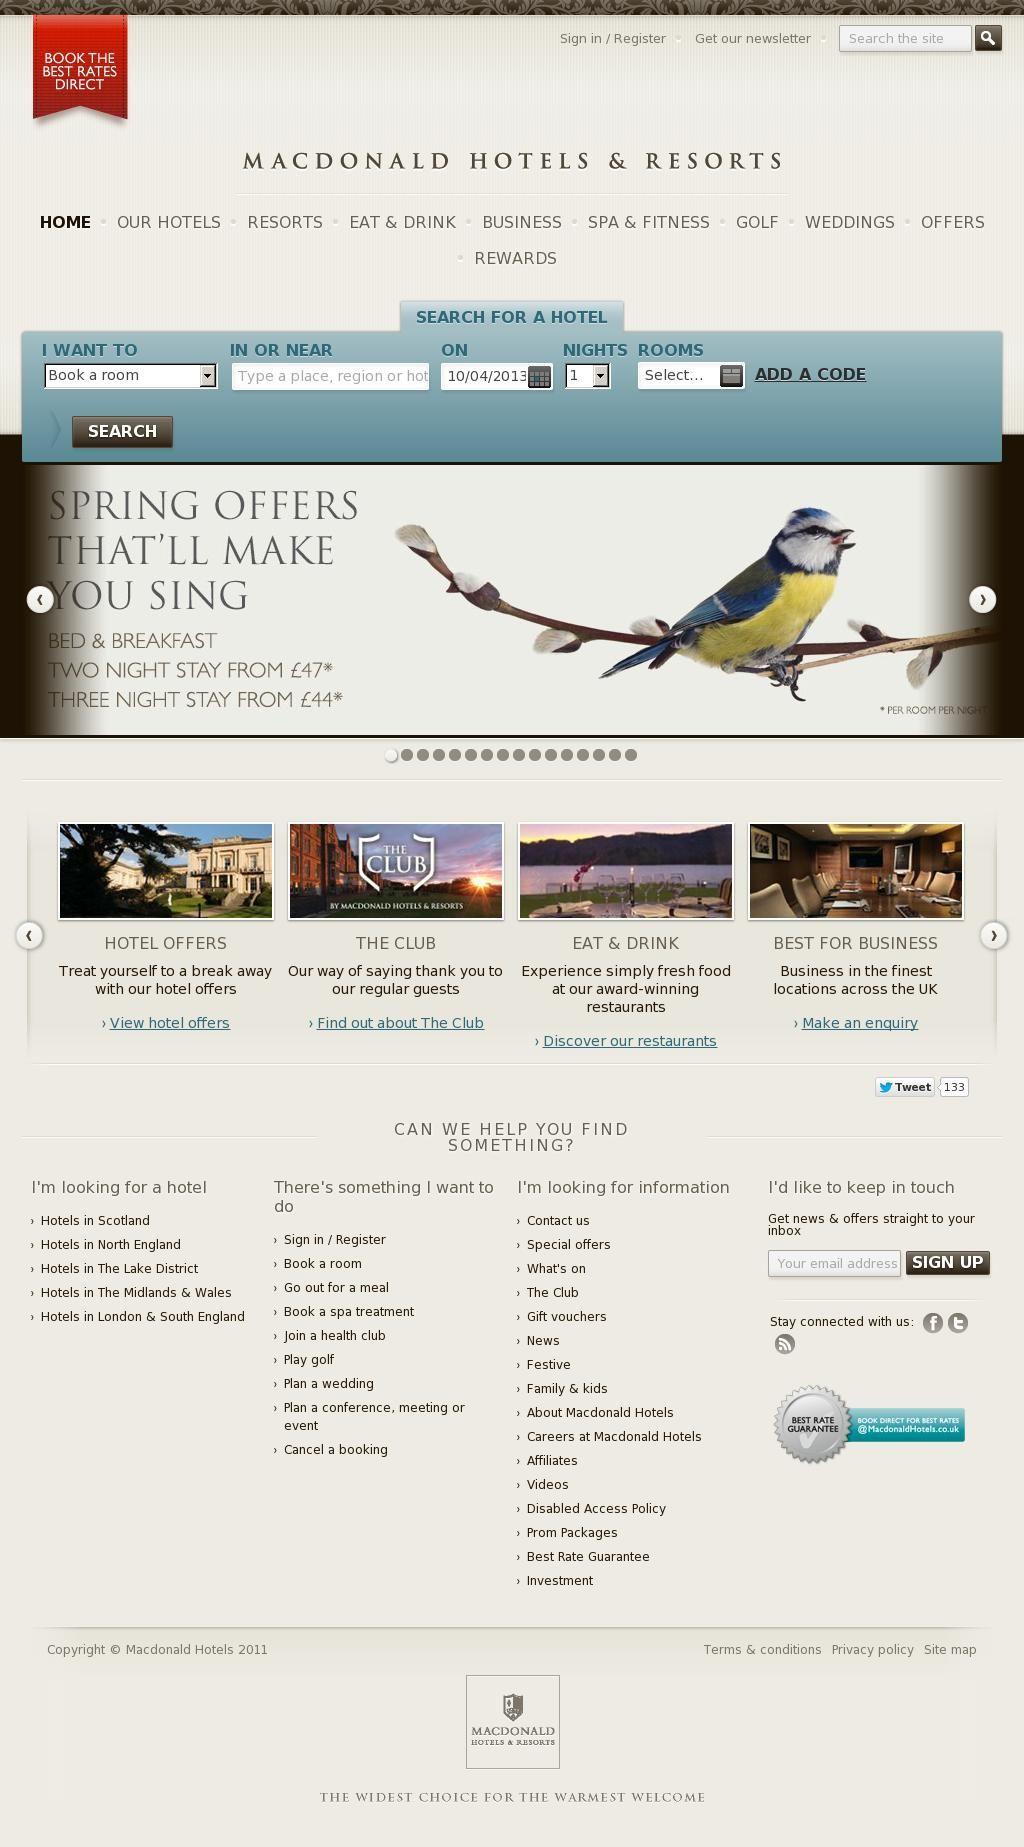 The Website Http Www Macdonaldhotels Co Uk Courtesy Of